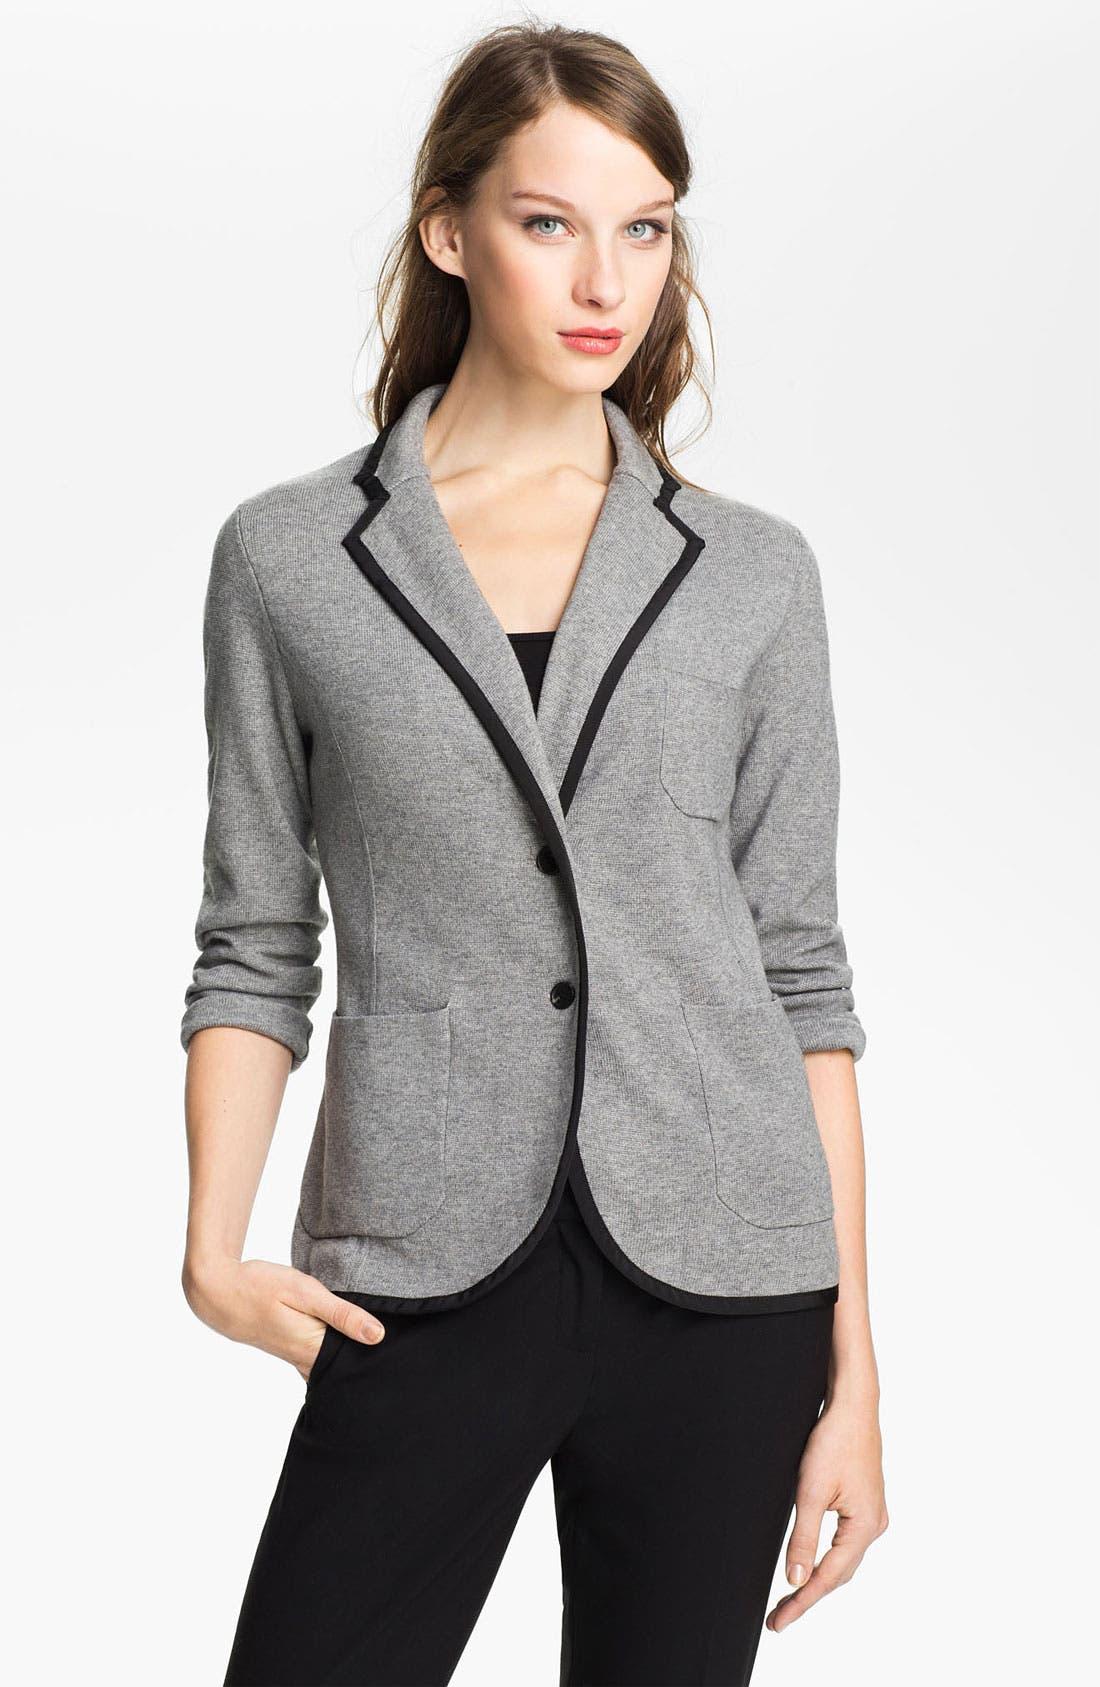 Main Image - Vince Camuto 'Milano Stitch' Sweater Jacket